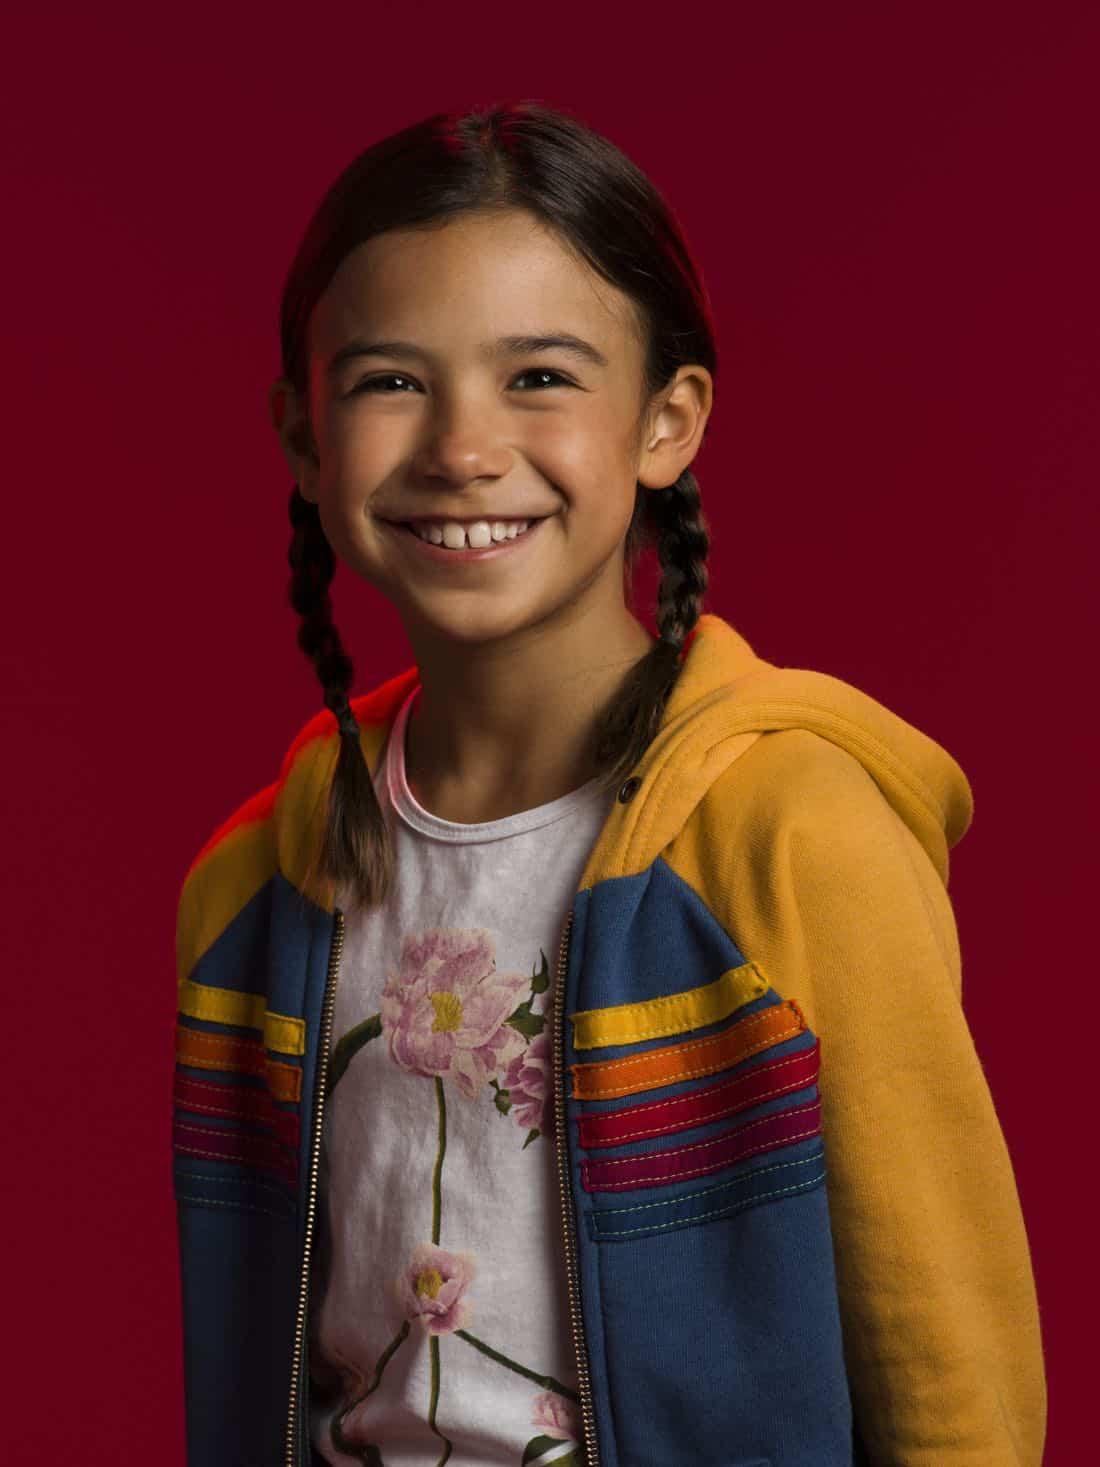 LUCIFER: Season 3 of LUCIFER premieres Monday, Oct. 2 on FOX. Scarlett Estevez. ©2017 Fox Broadcasting Co. CR: Jason Bell/FOX